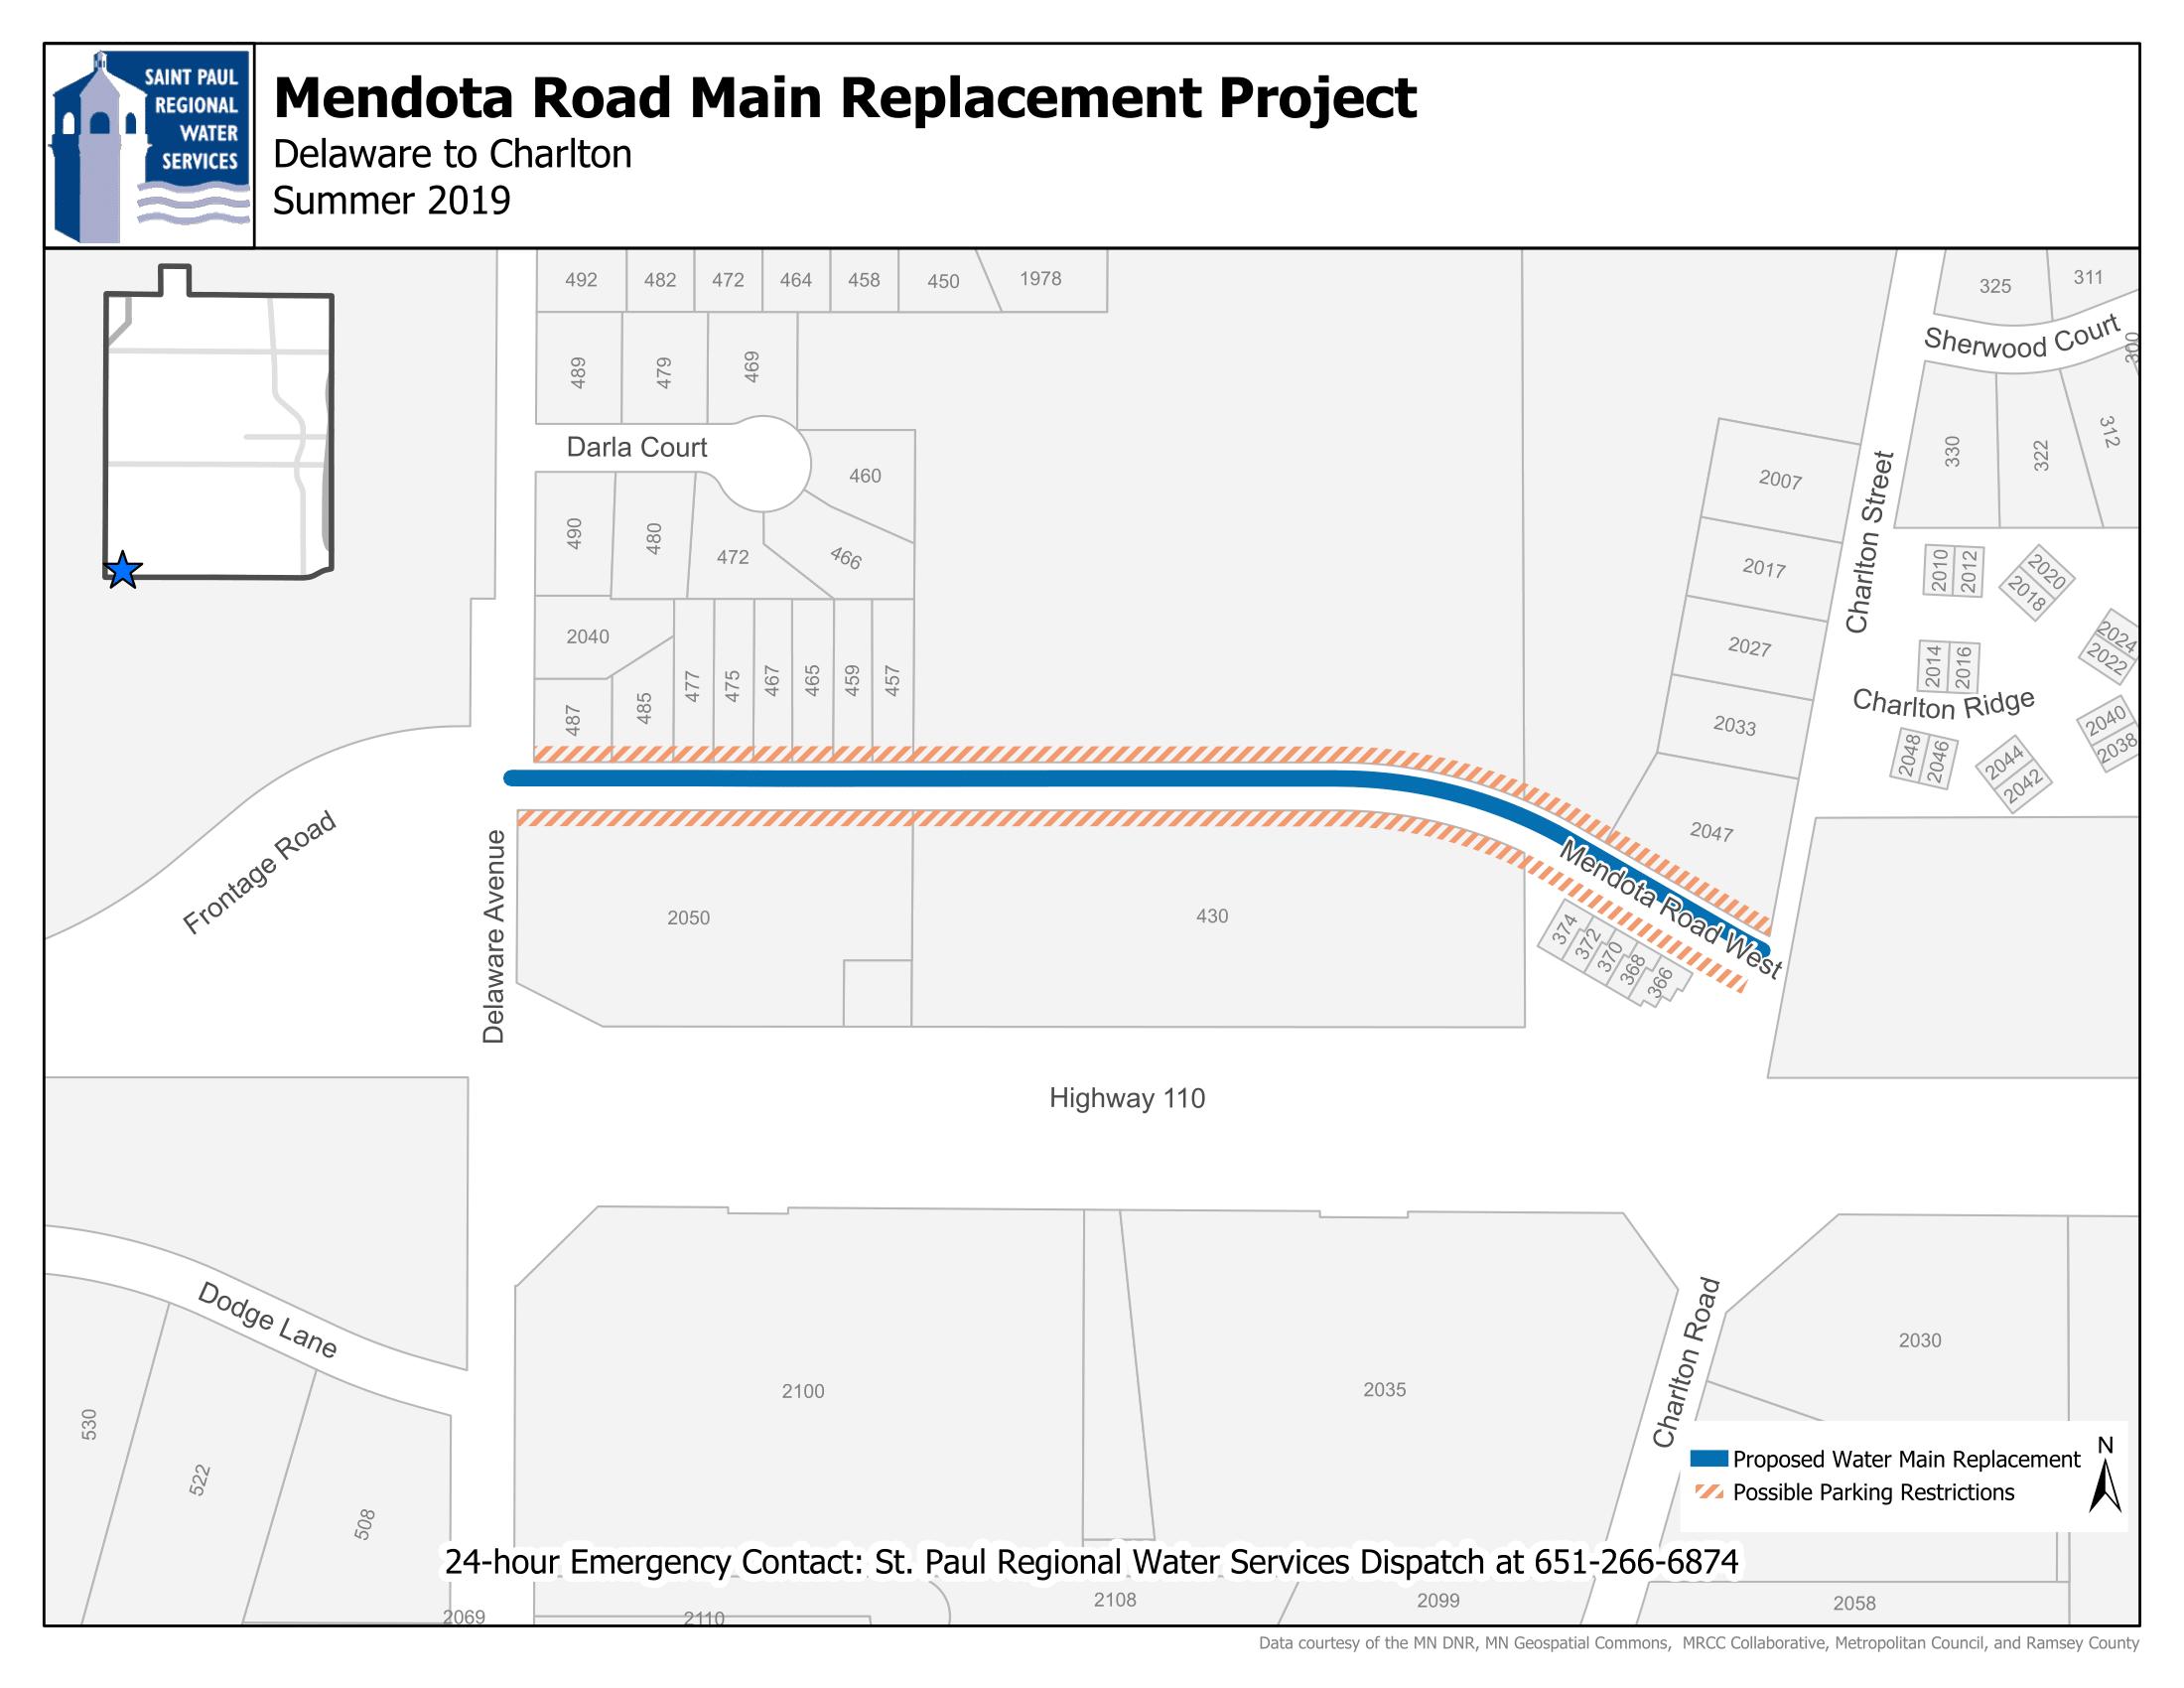 Mendota Project Map Image